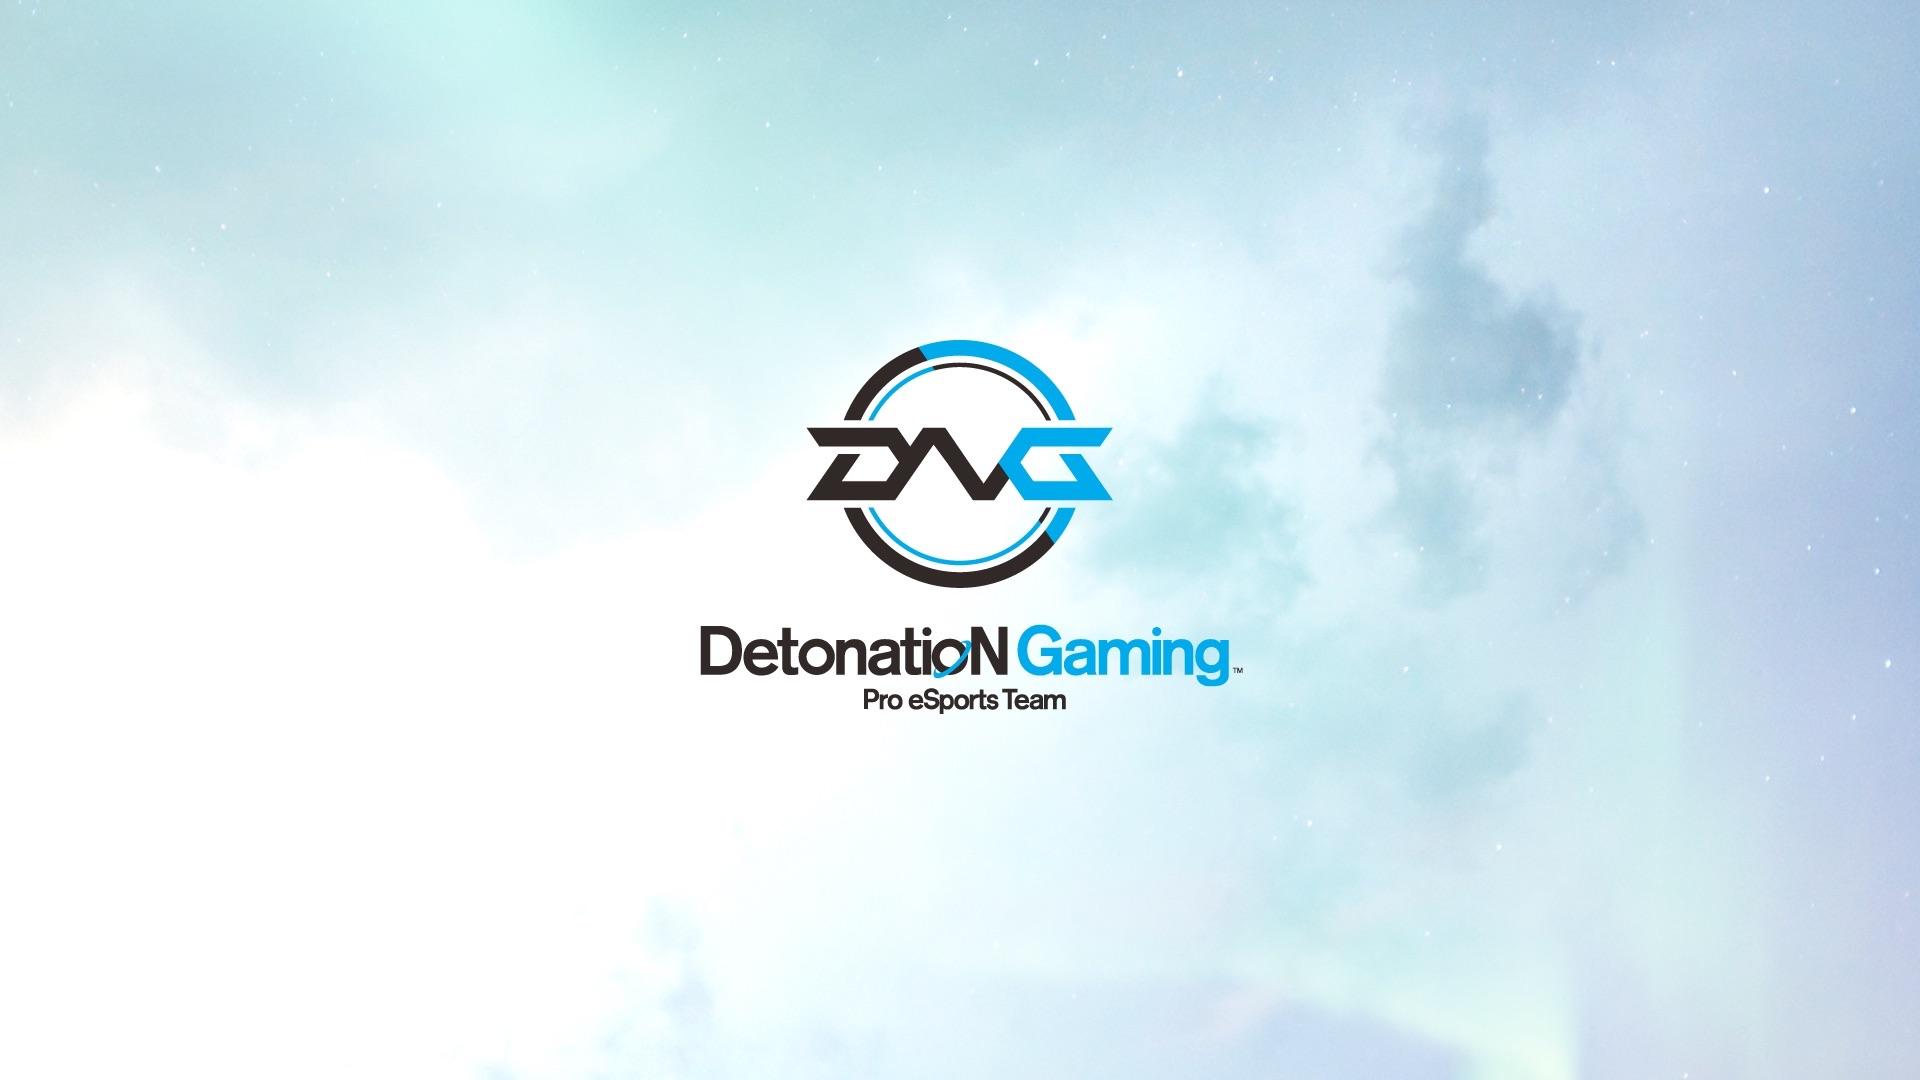 DetonatioN Gamingと福助がスポンサー契約